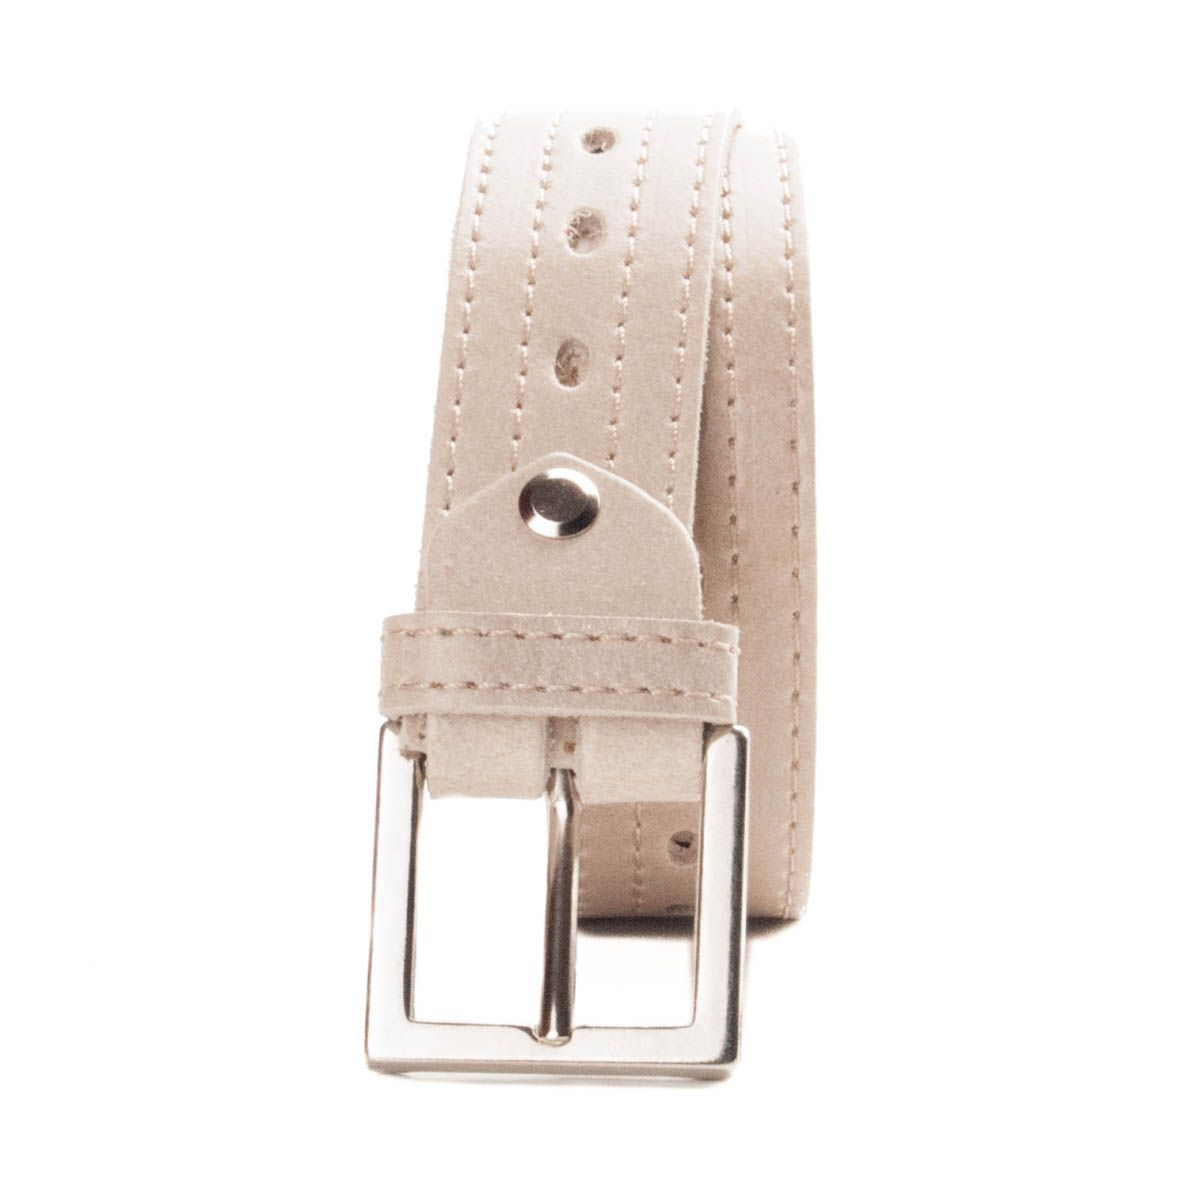 Montevita Casual Quality Belt in Beige